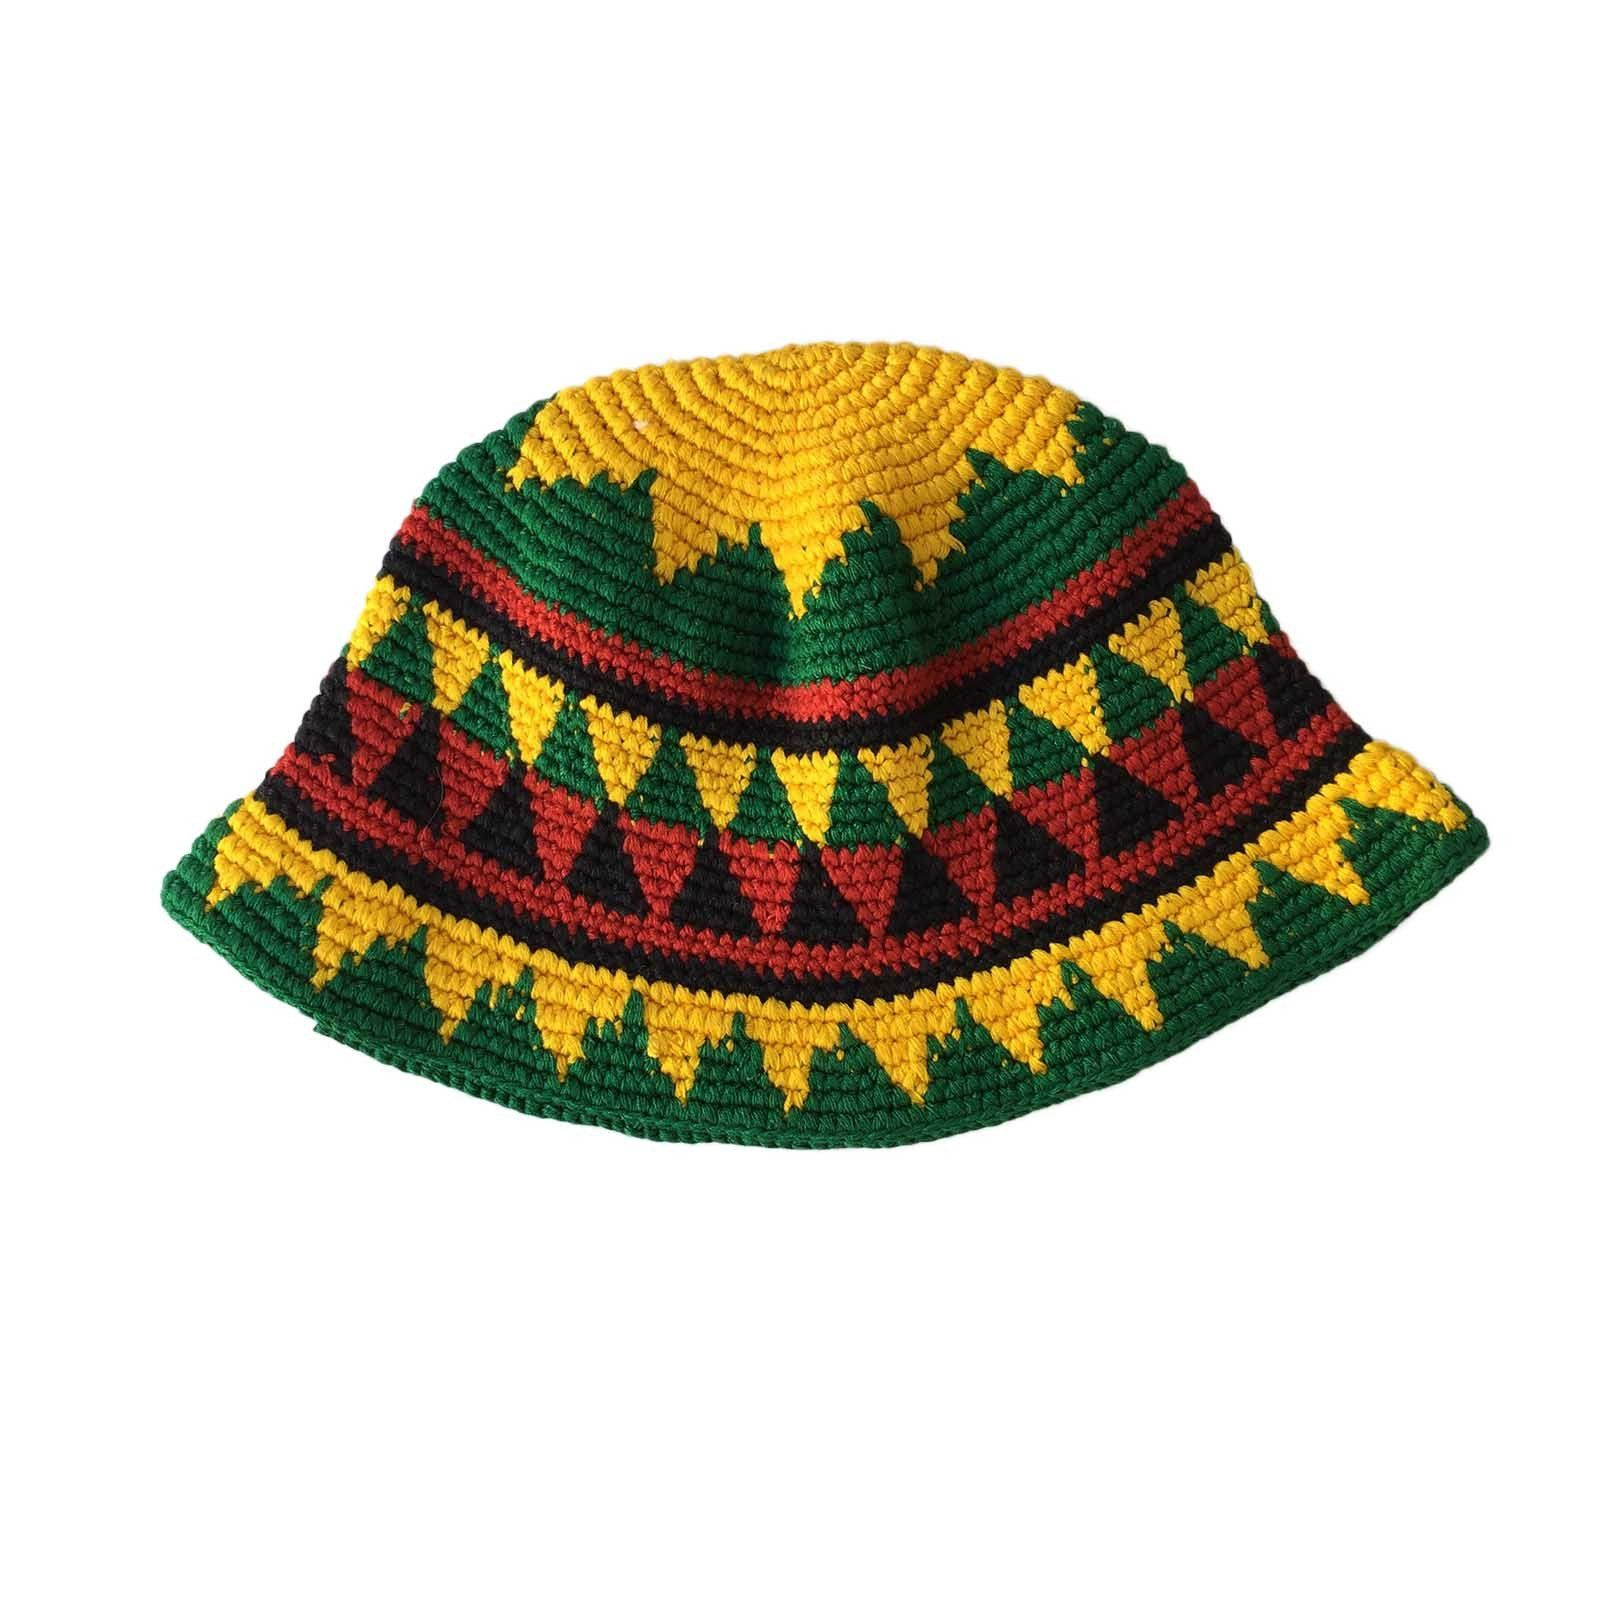 c7ee9c8349a Skullcap Skull Cap Kufi Rasta Surfer Reggae Jamaica Handmade 100% Cotton SM  fit